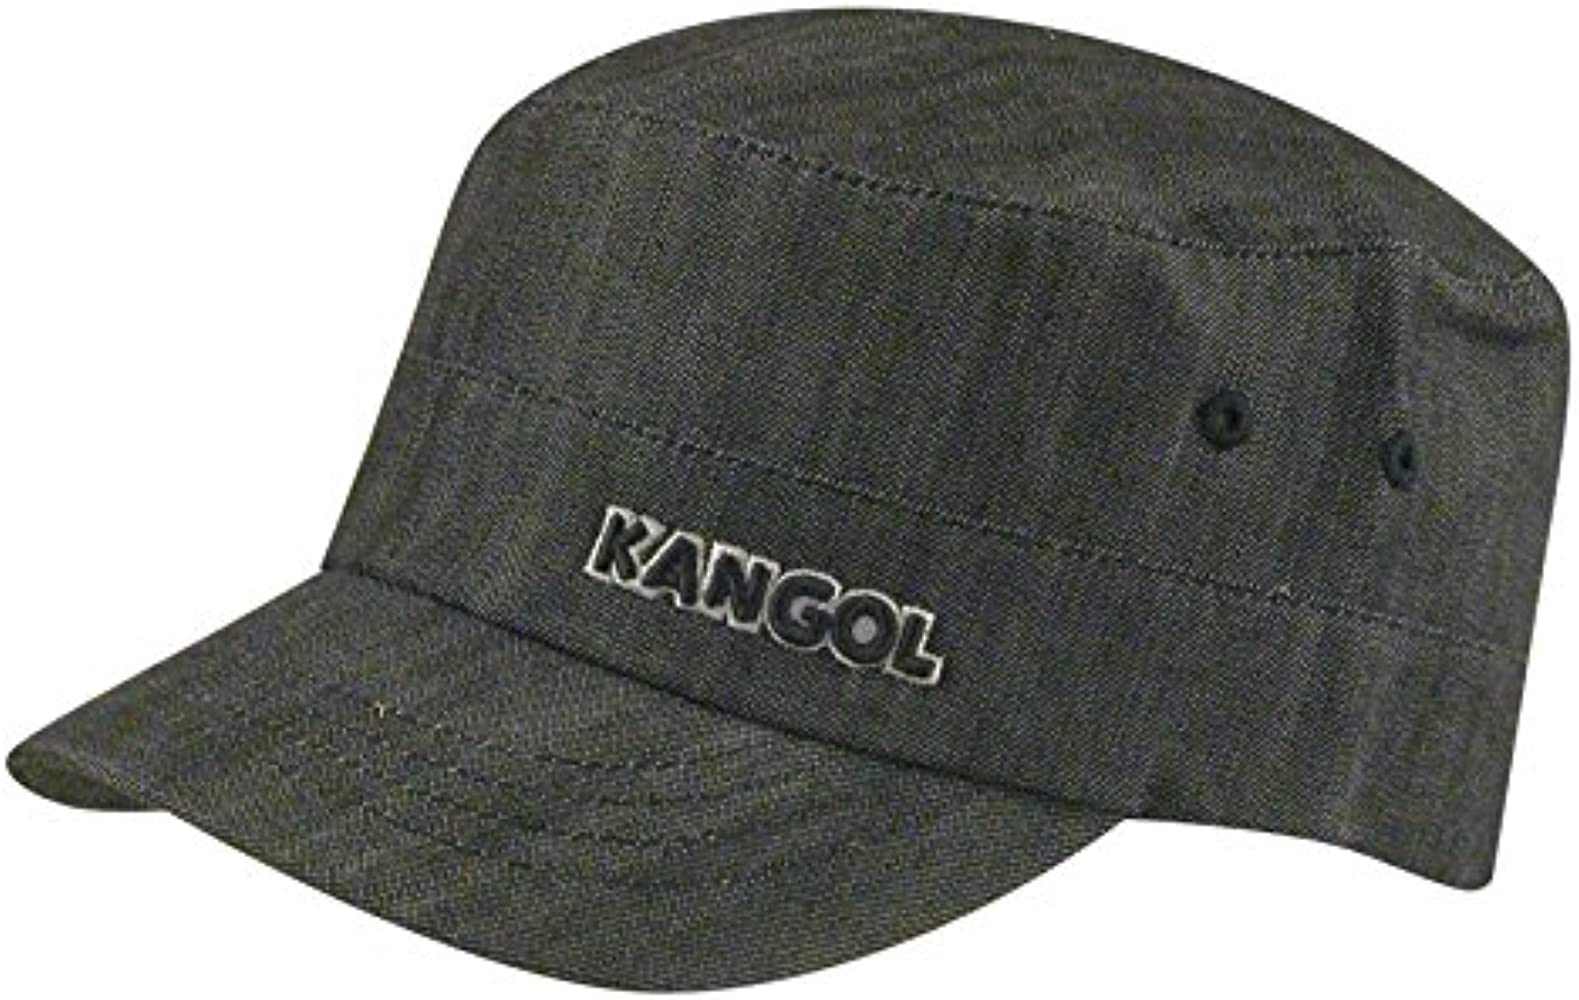 Kangol Denim Army Cap Gorra, Black, S/M para Hombre: Amazon.es ...